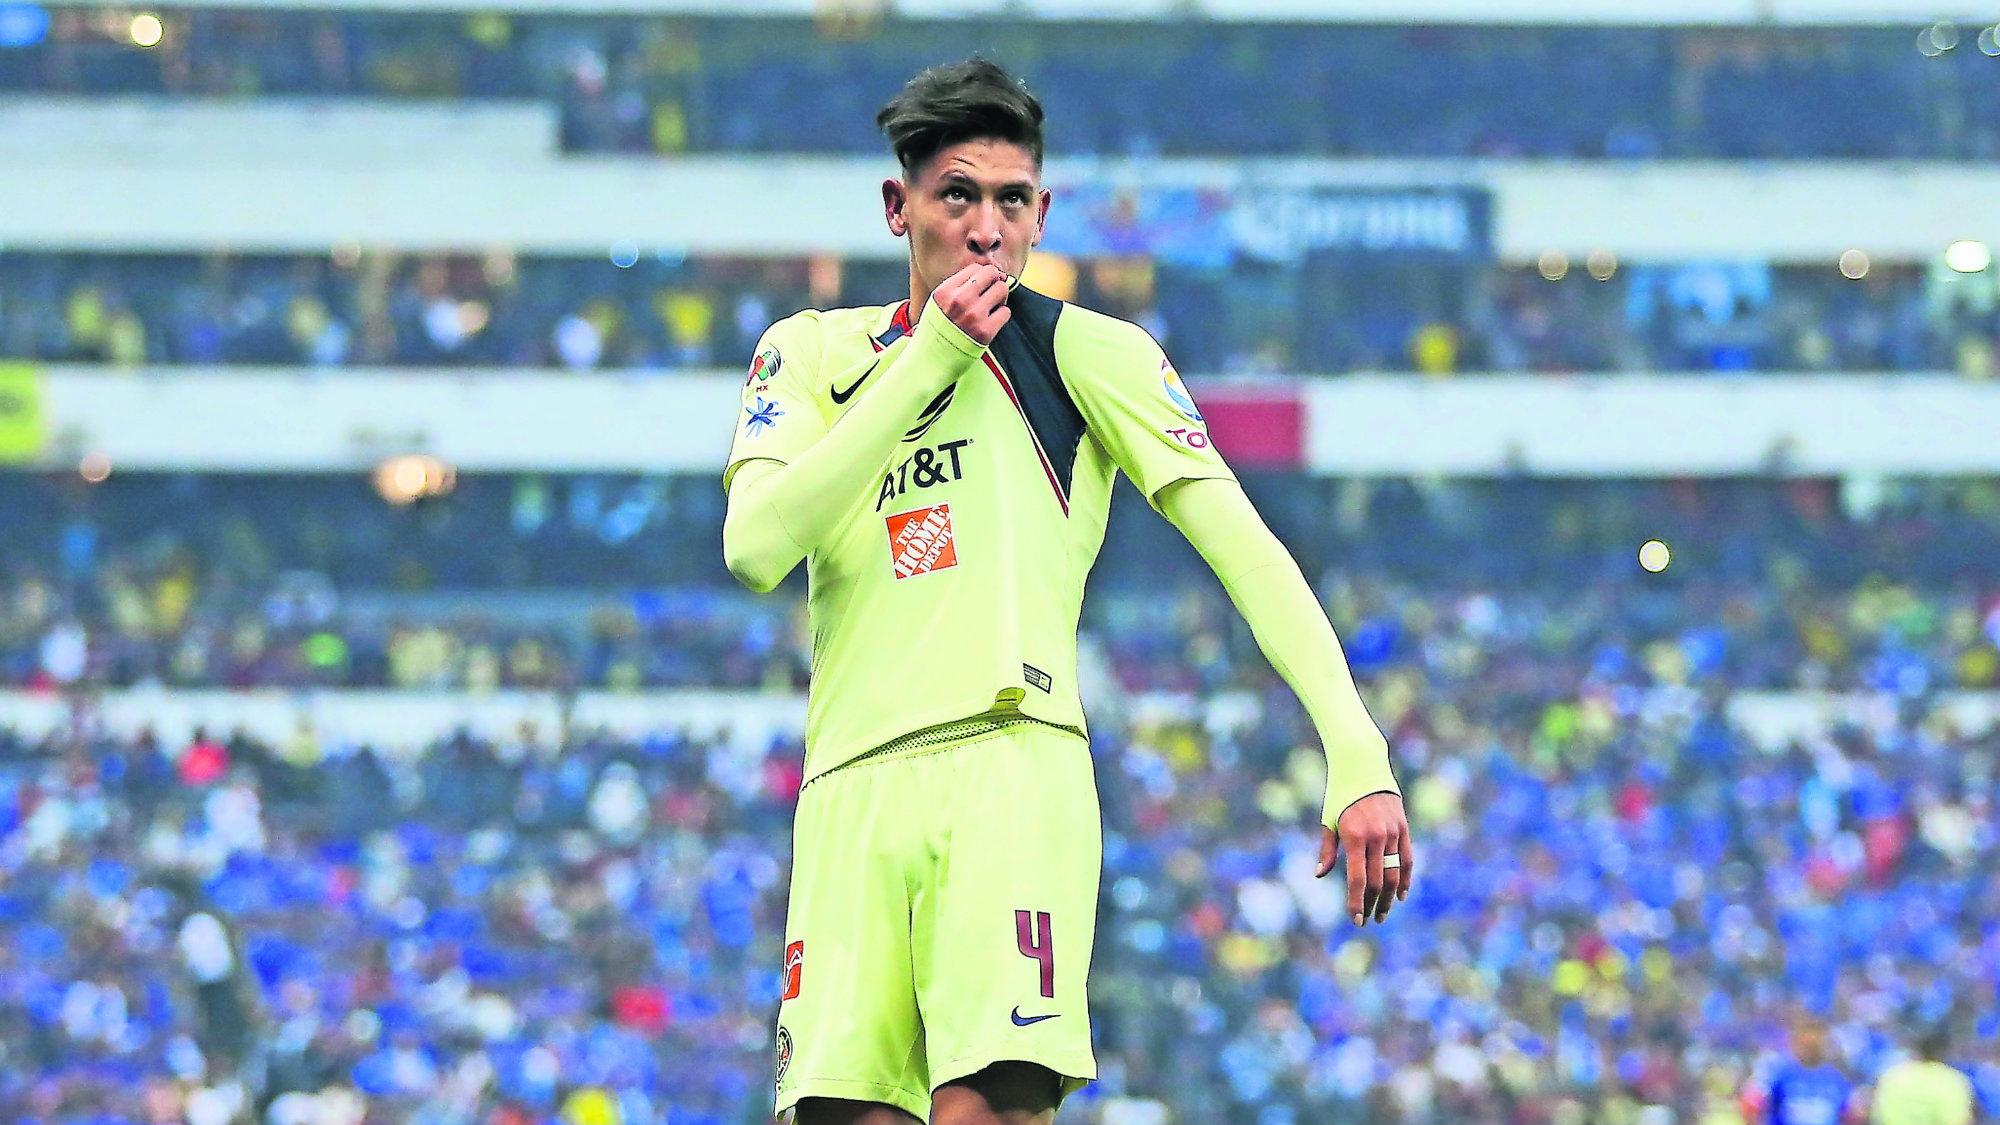 Edson Álvarez Piojo Herrera América Pase a Europa Transferencia